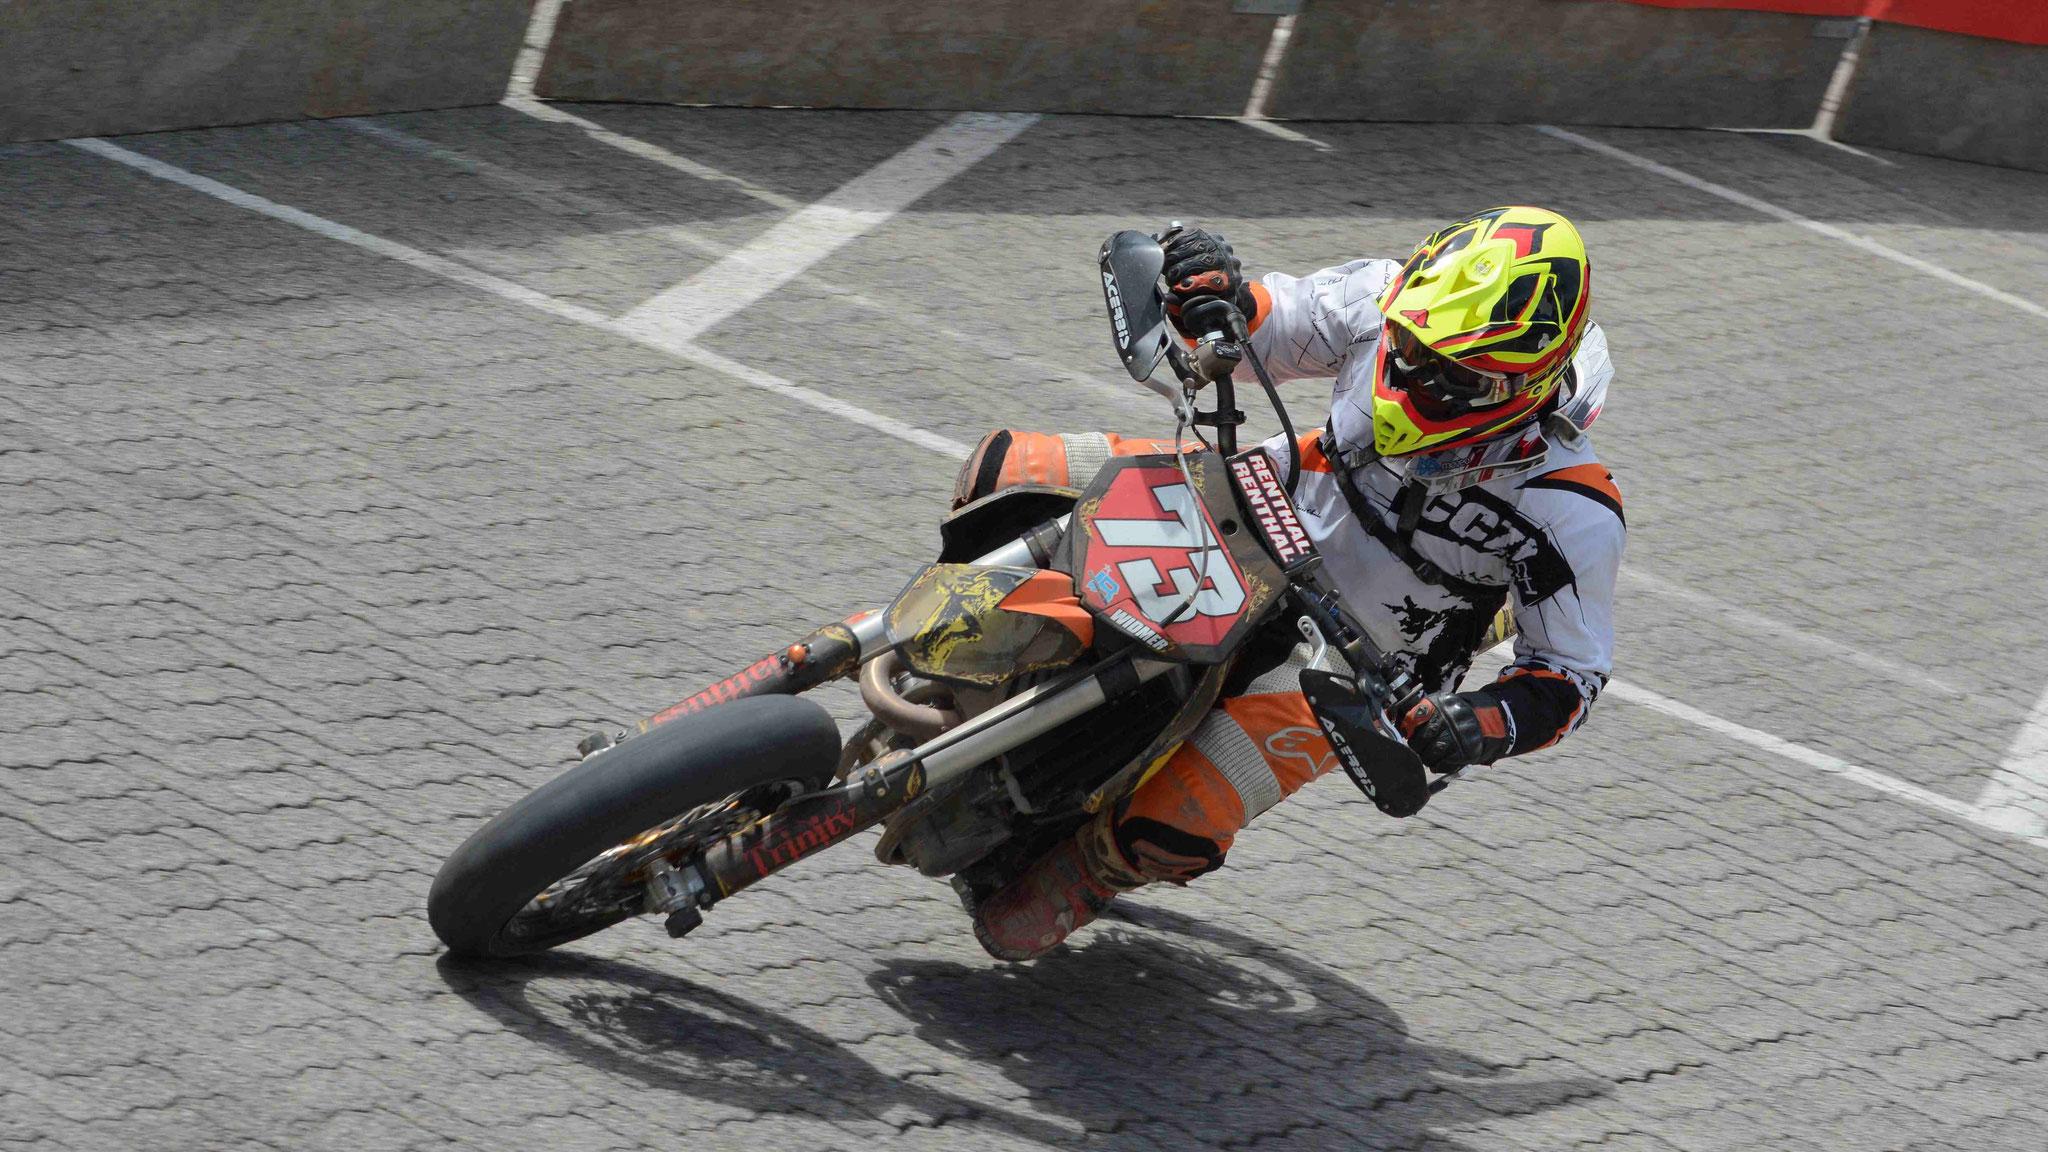 #73 Samuel Widmer - KTM 450